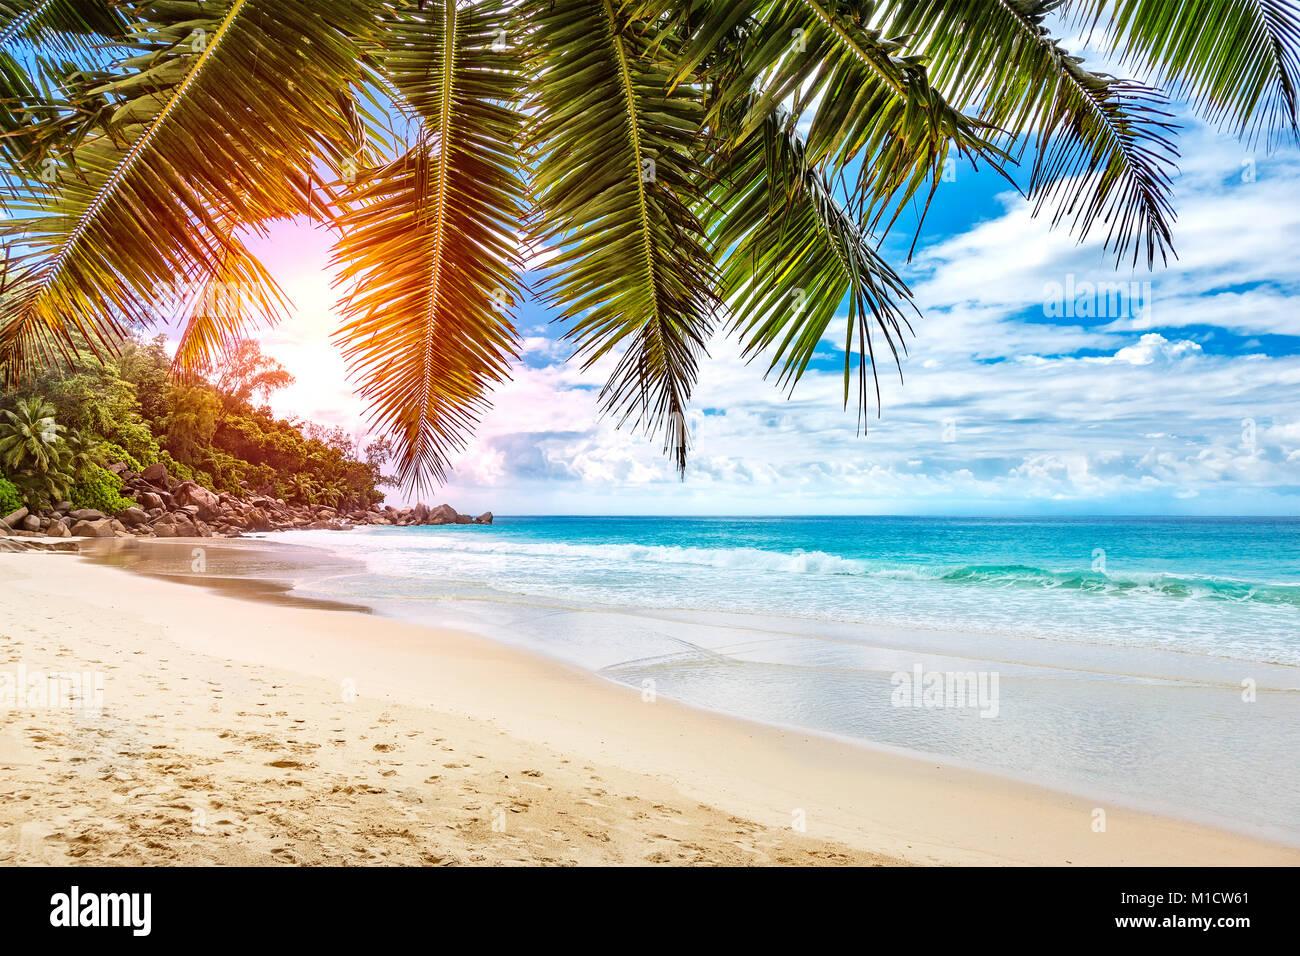 Tropical Island Beach Ocean Sunset: Palm Tree Over Beach Sunset Stock Photos & Palm Tree Over